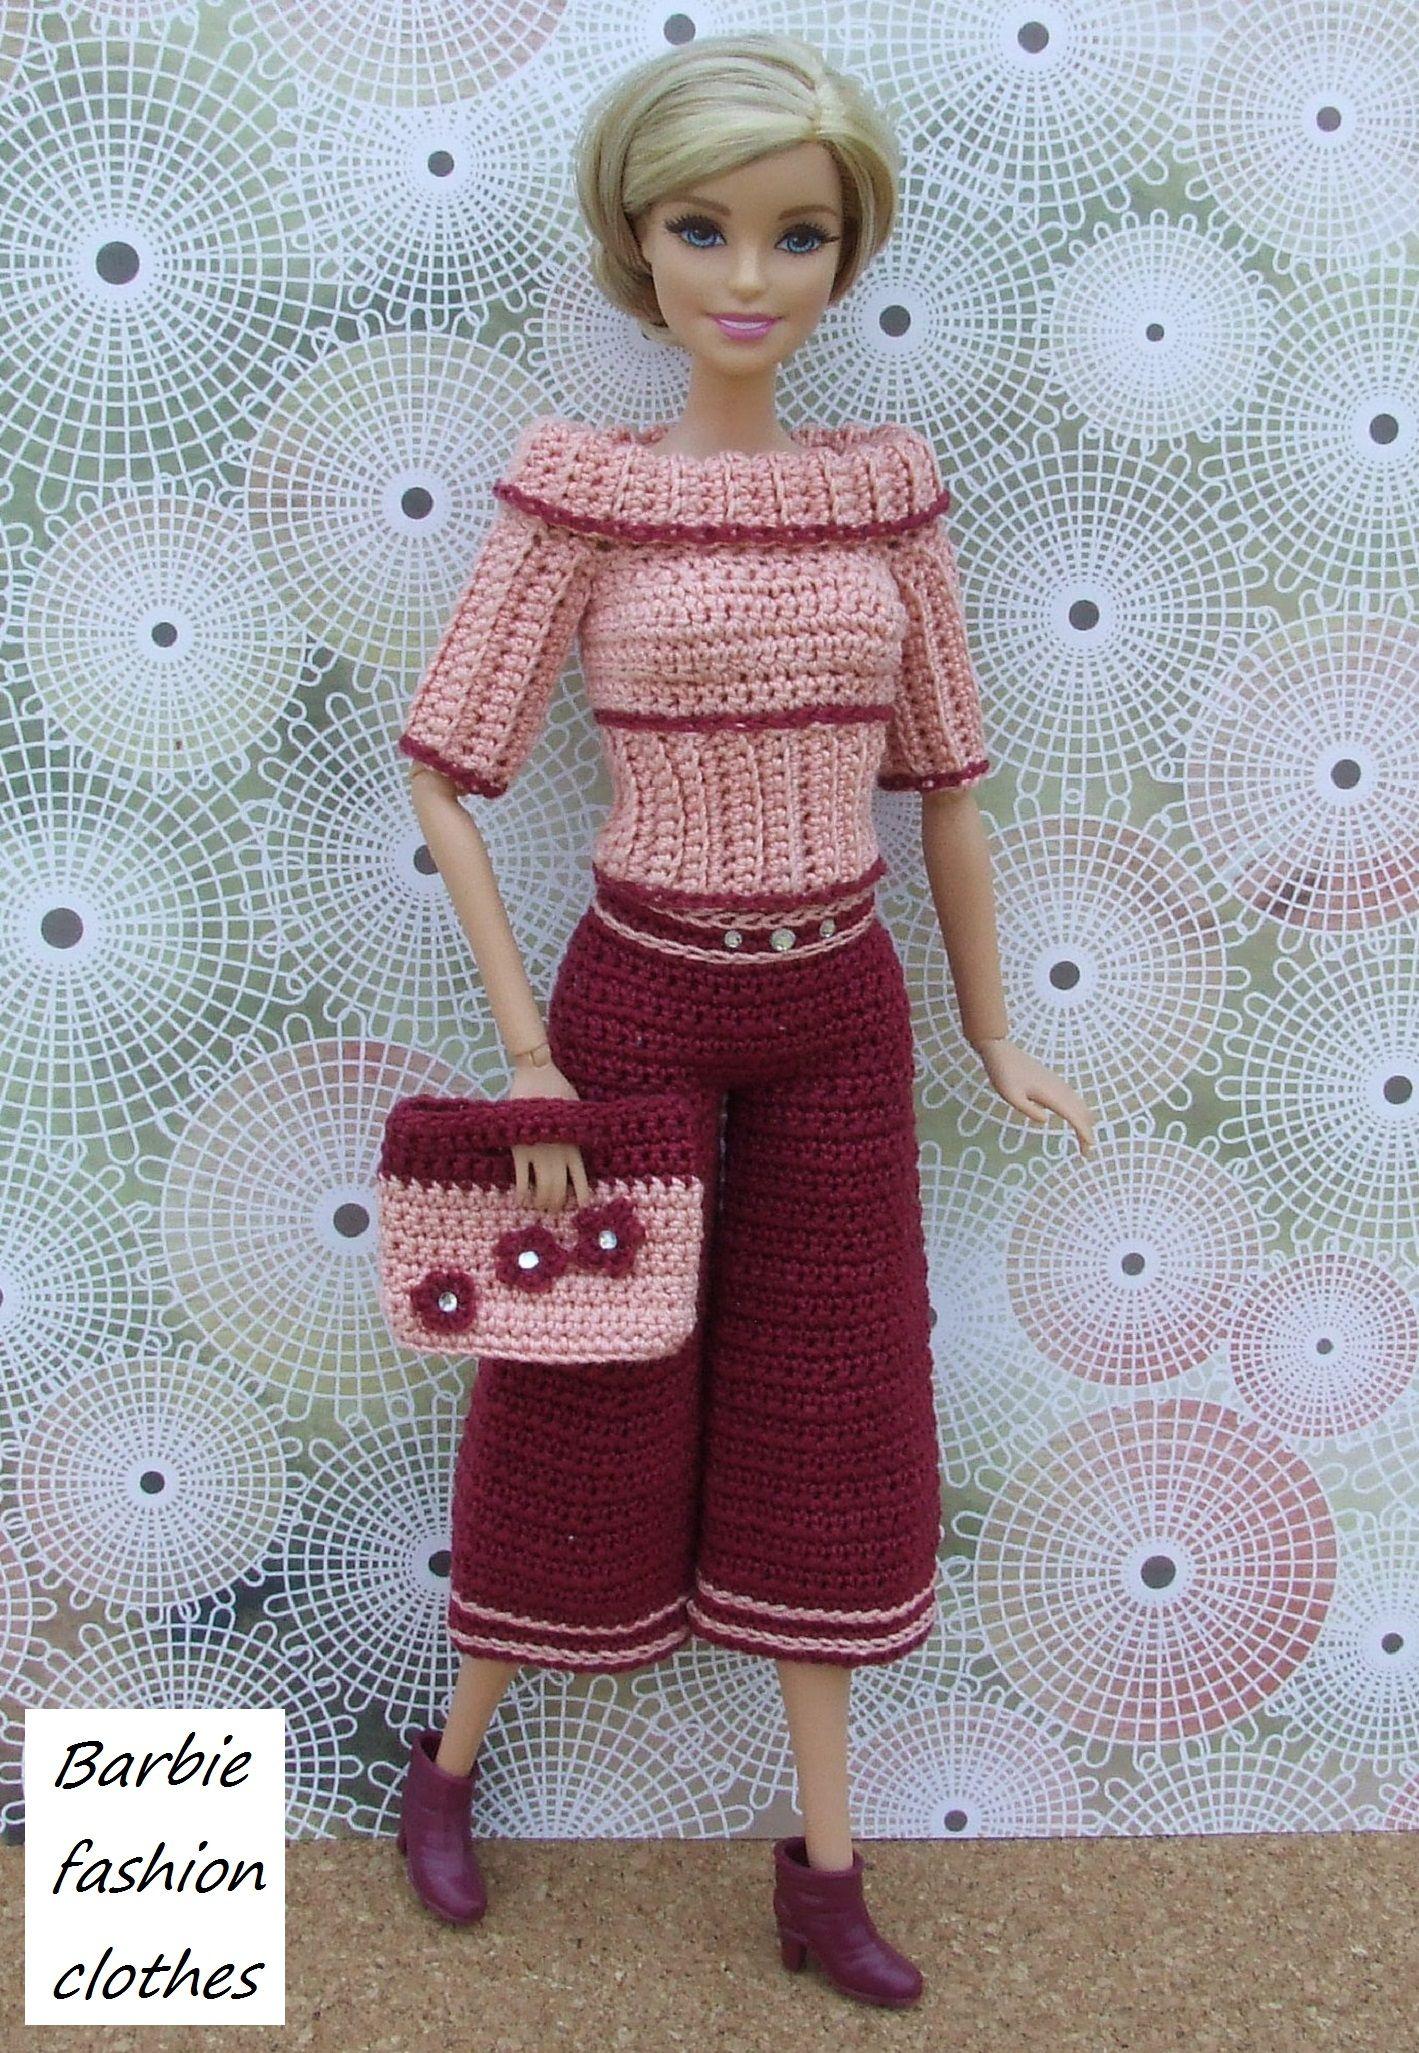 Pin von Anel Lombard auf Barbie fashion clothes | Pinterest ...